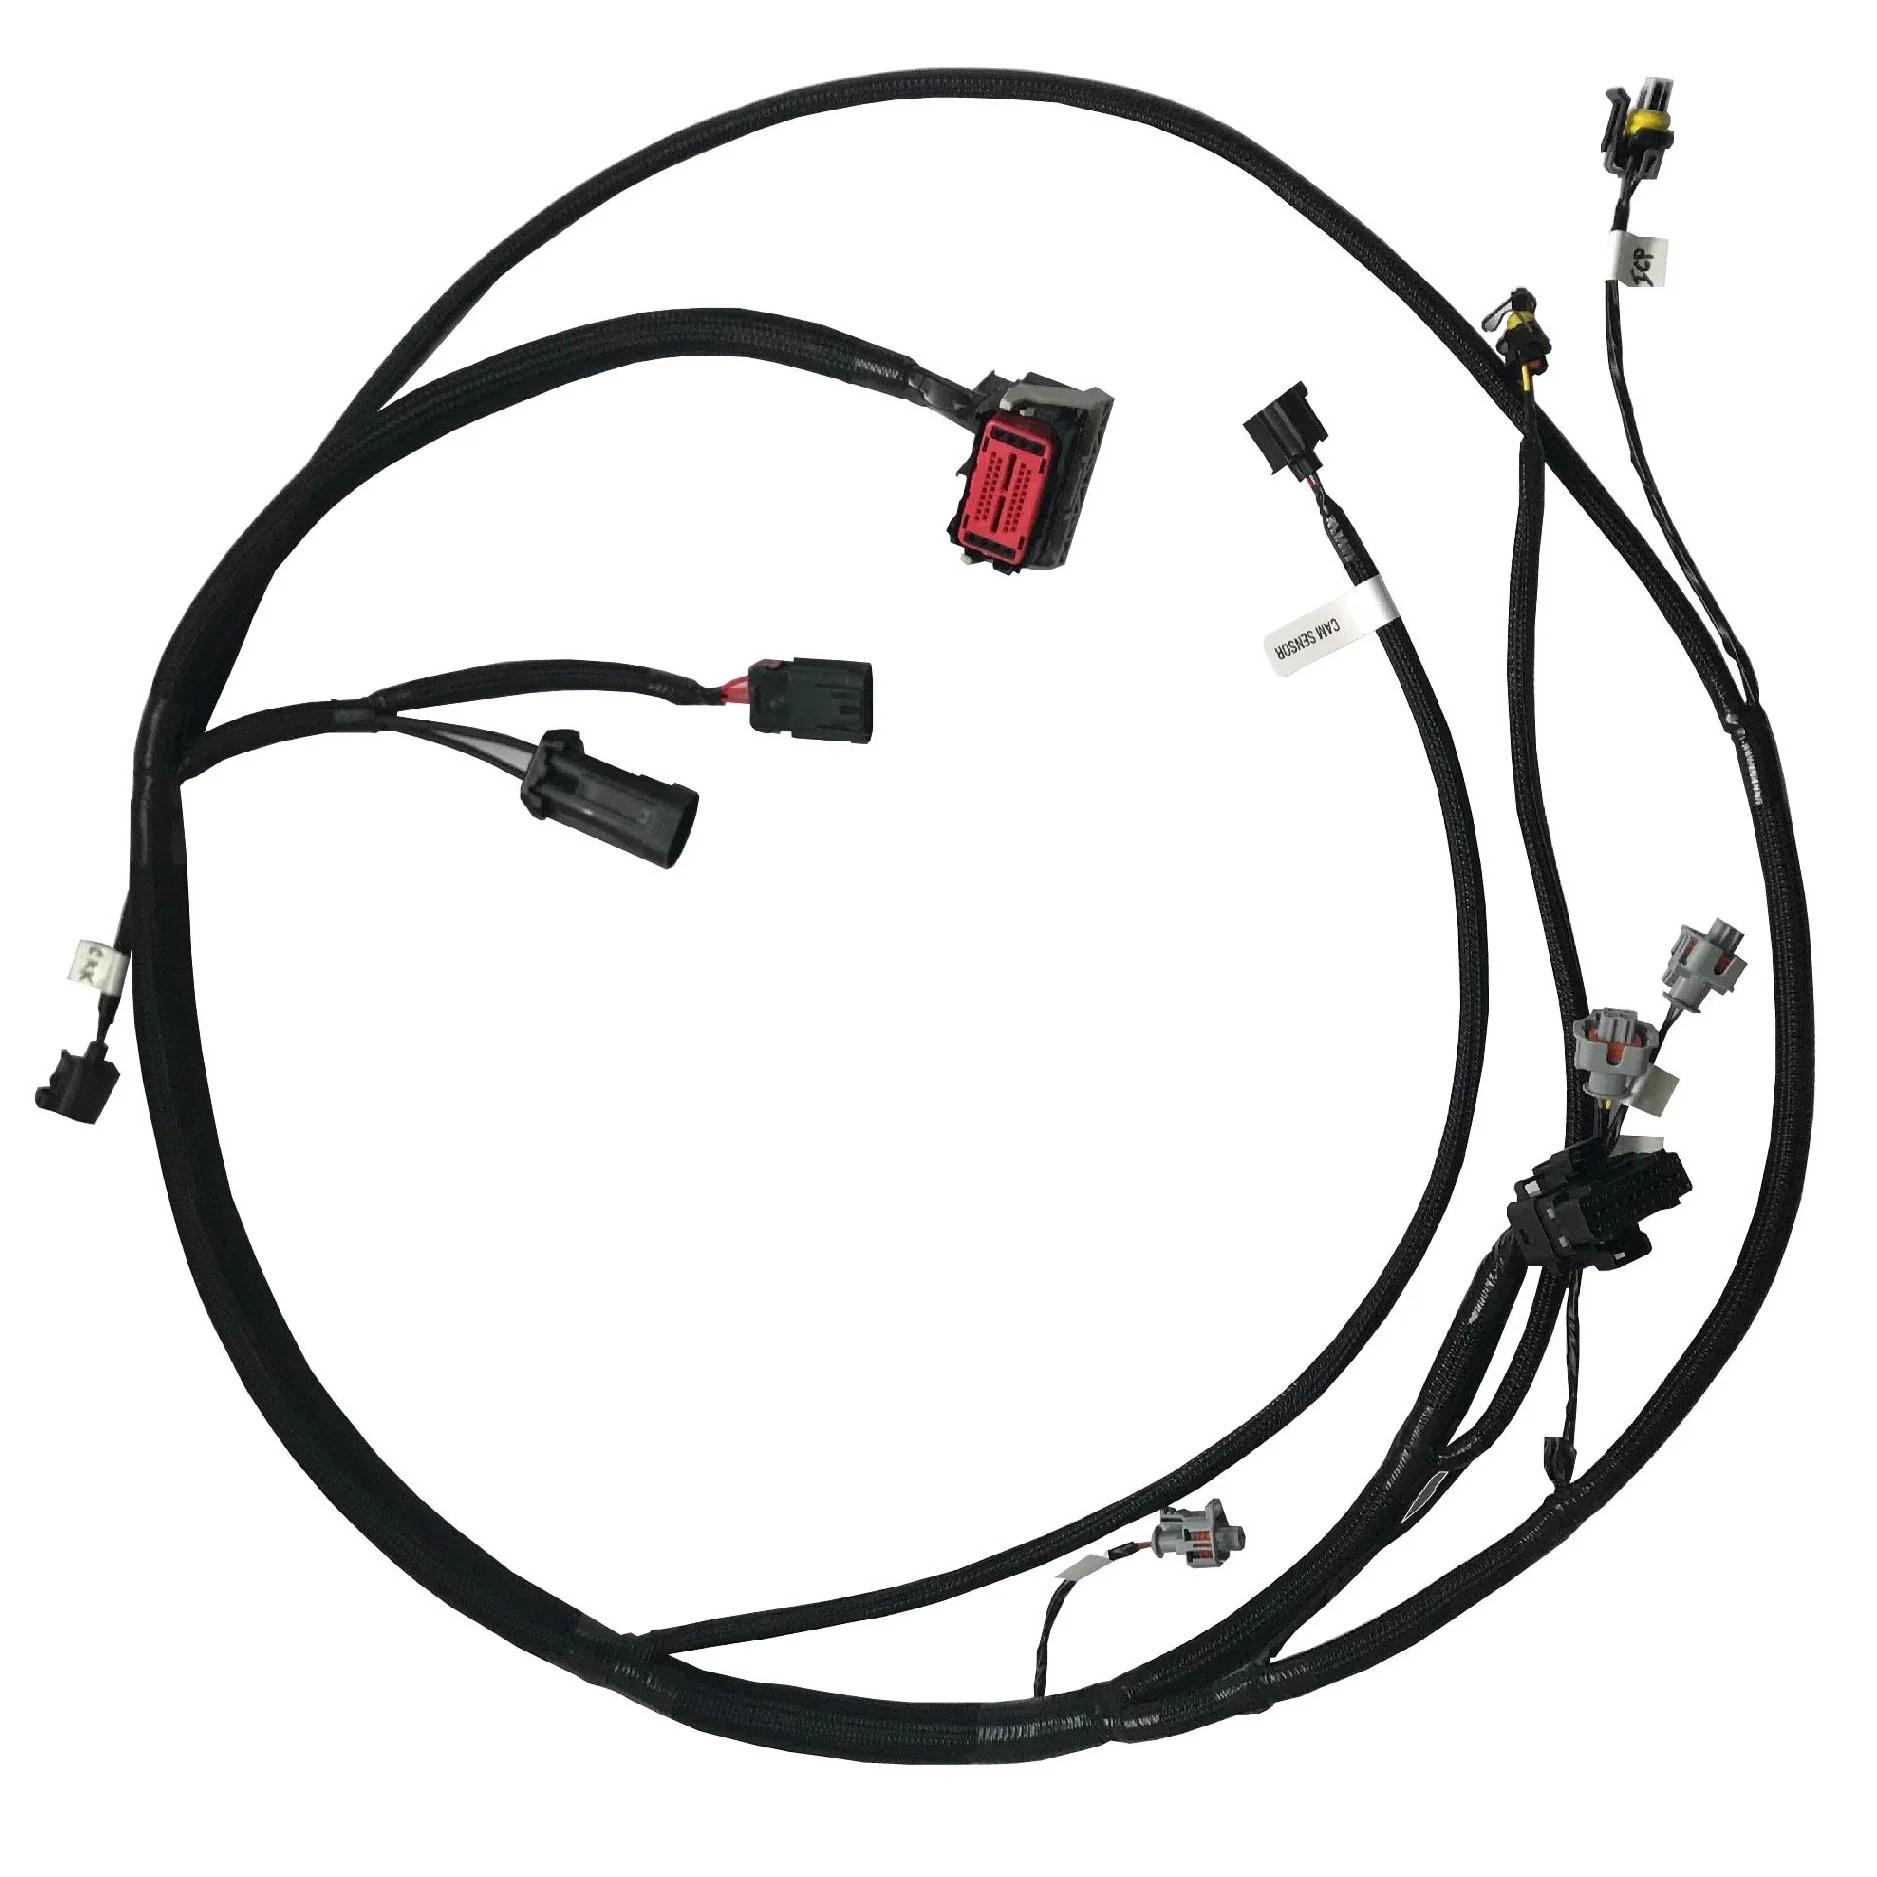 warren diesel injection llc stand alone wire harness 6 0l 6 0 powerstroke wire harness problems powerstroke wire harness [ 1877 x 1877 Pixel ]